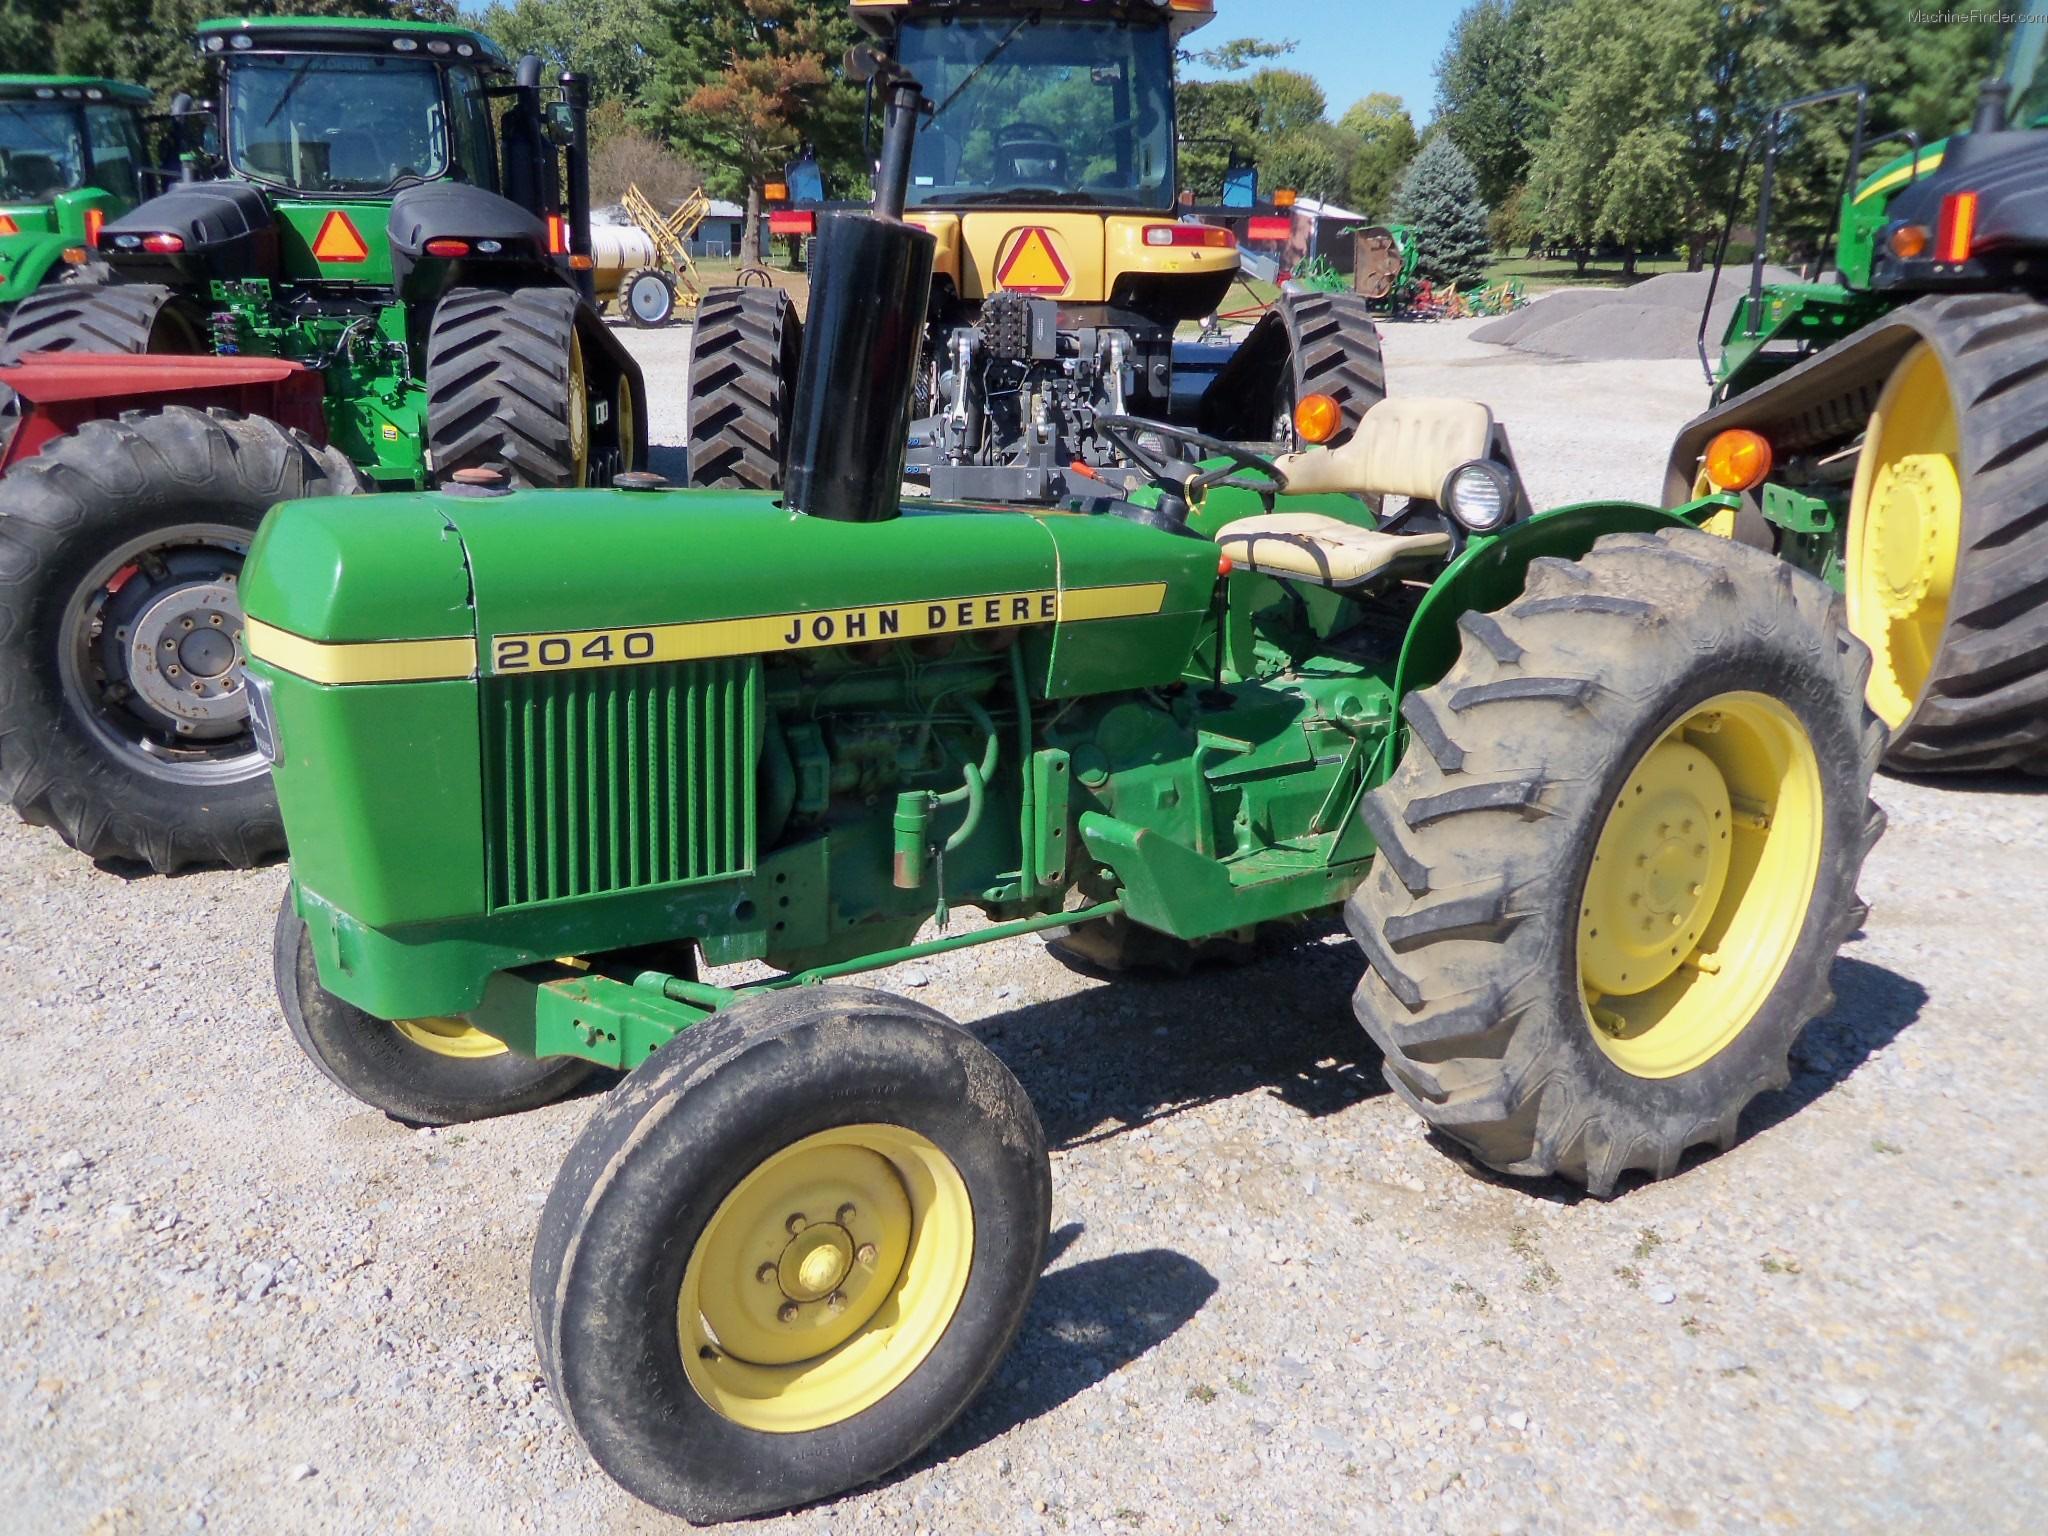 Used Farm & Agricultural Equipment - John Deere MachineFinder